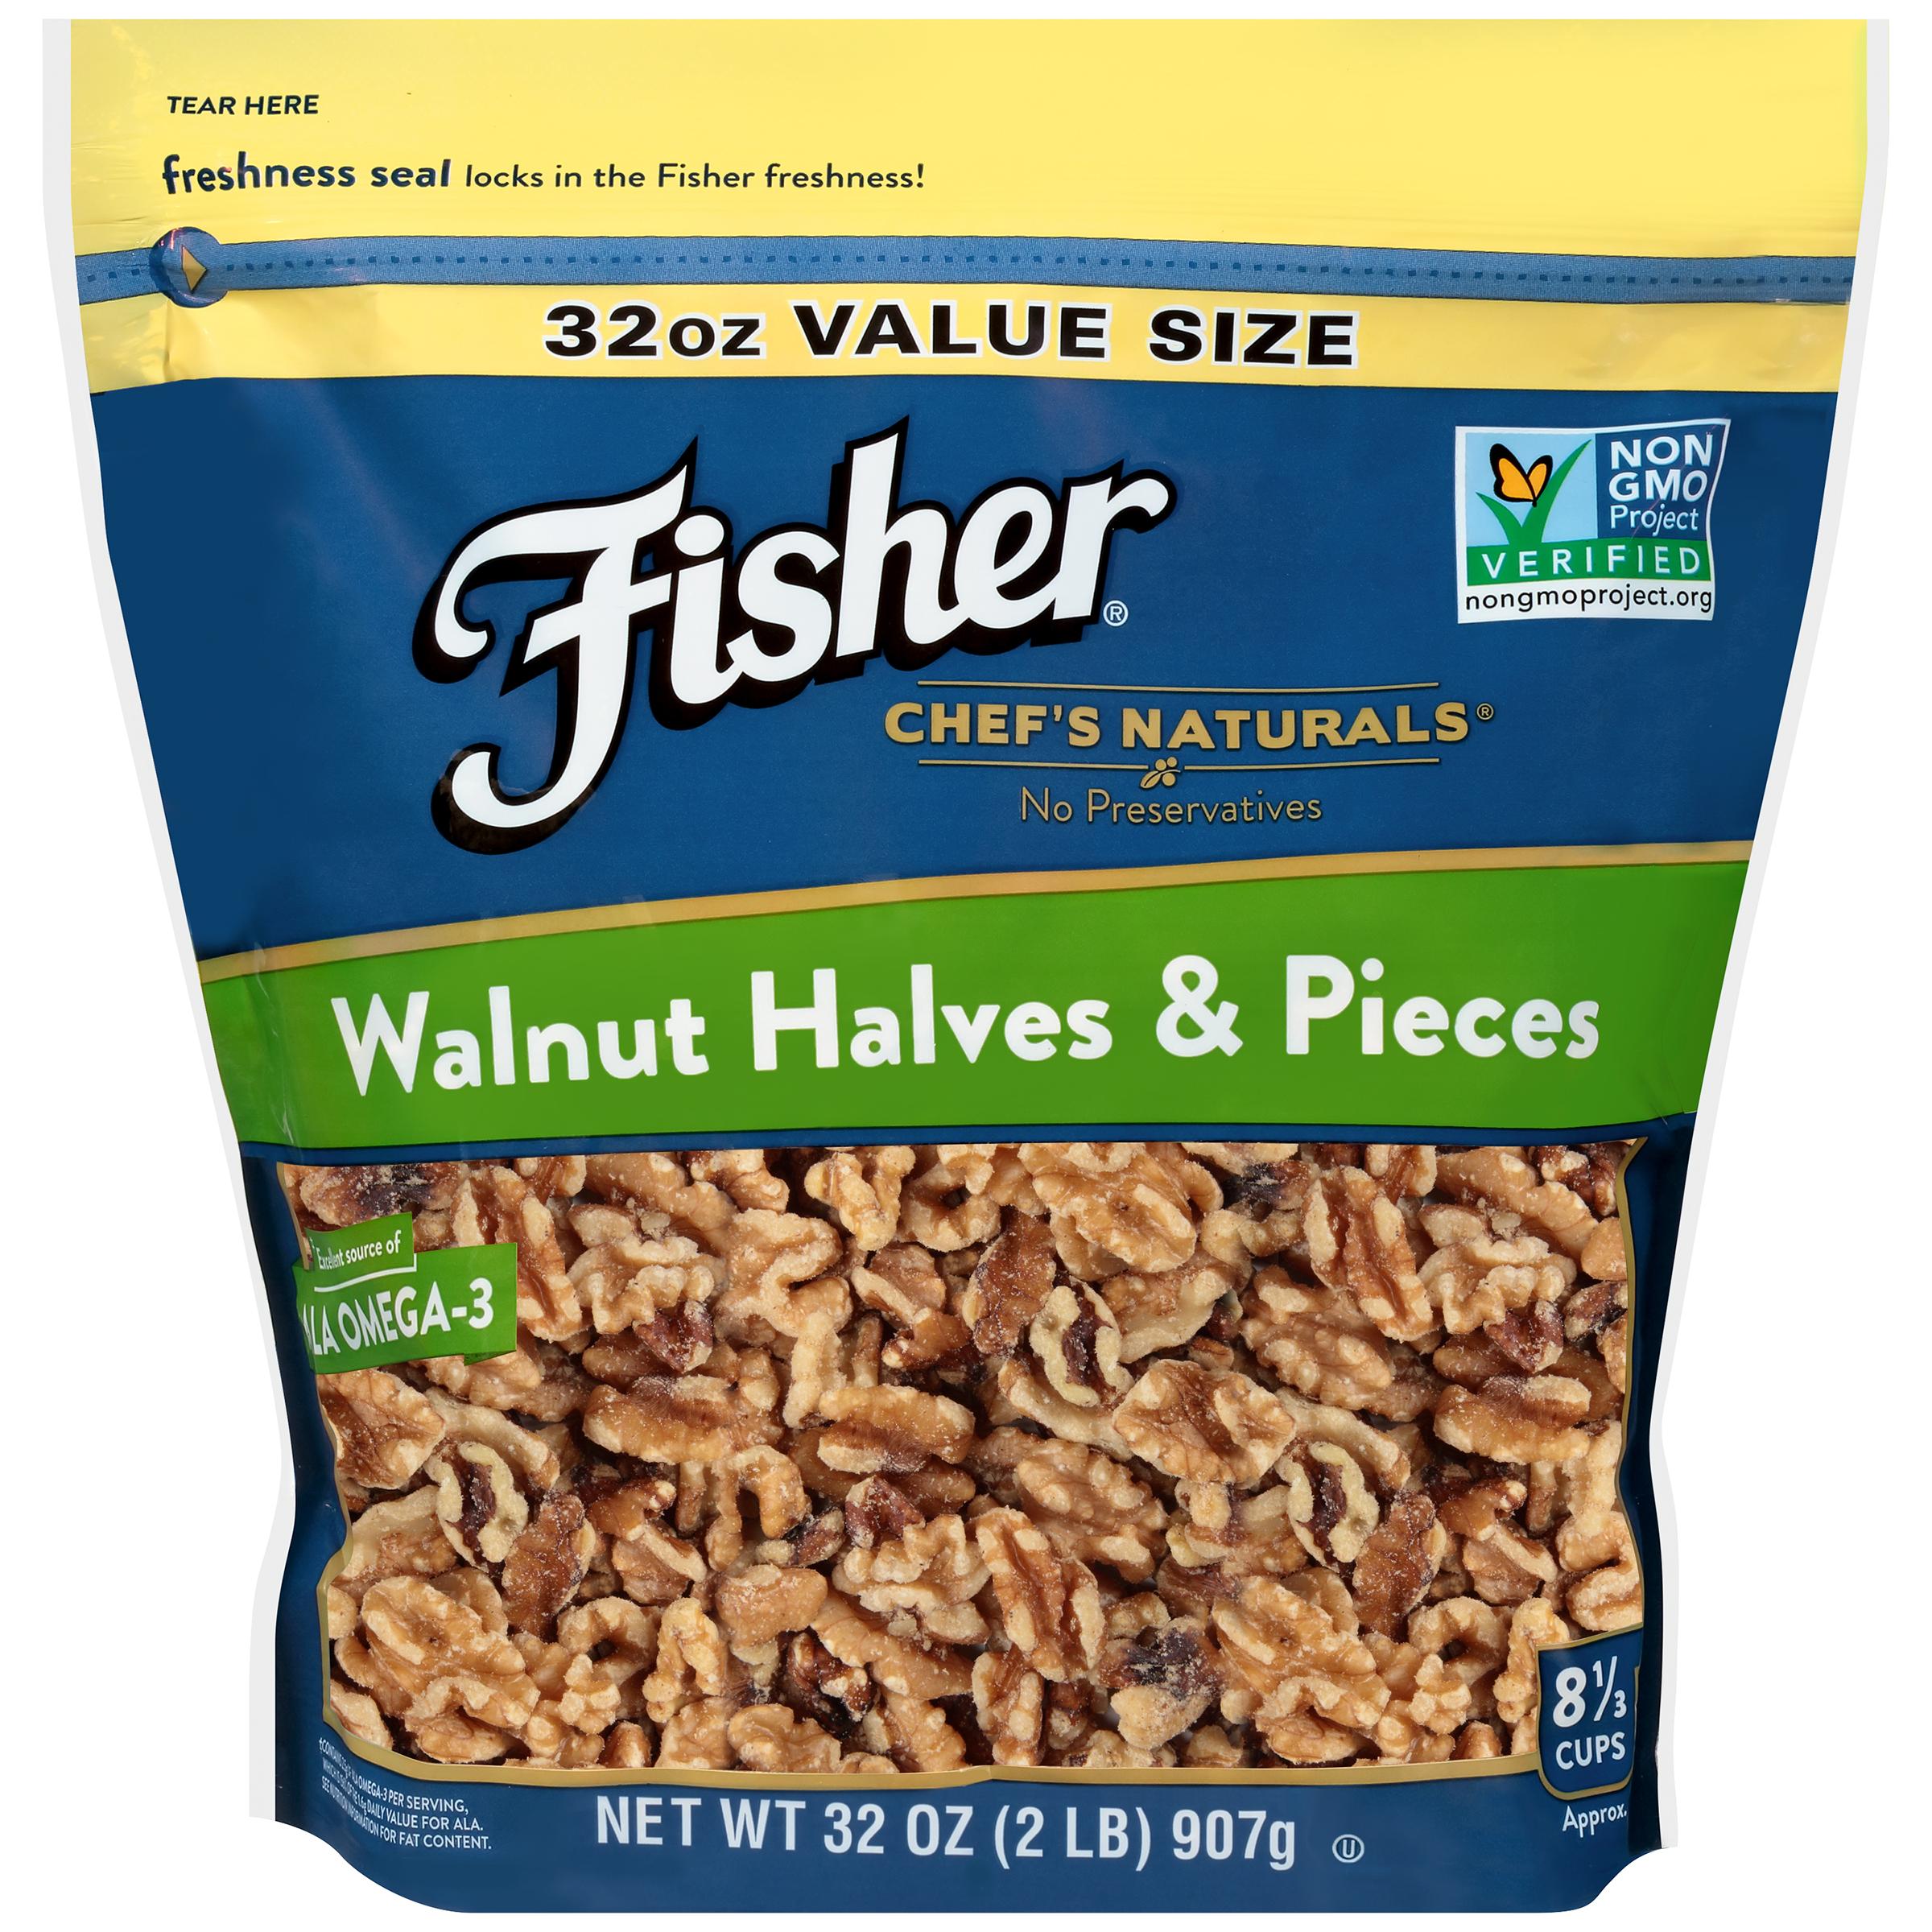 Fisher Chef's Naturals Walnut Halves & Pieces, 32 oz